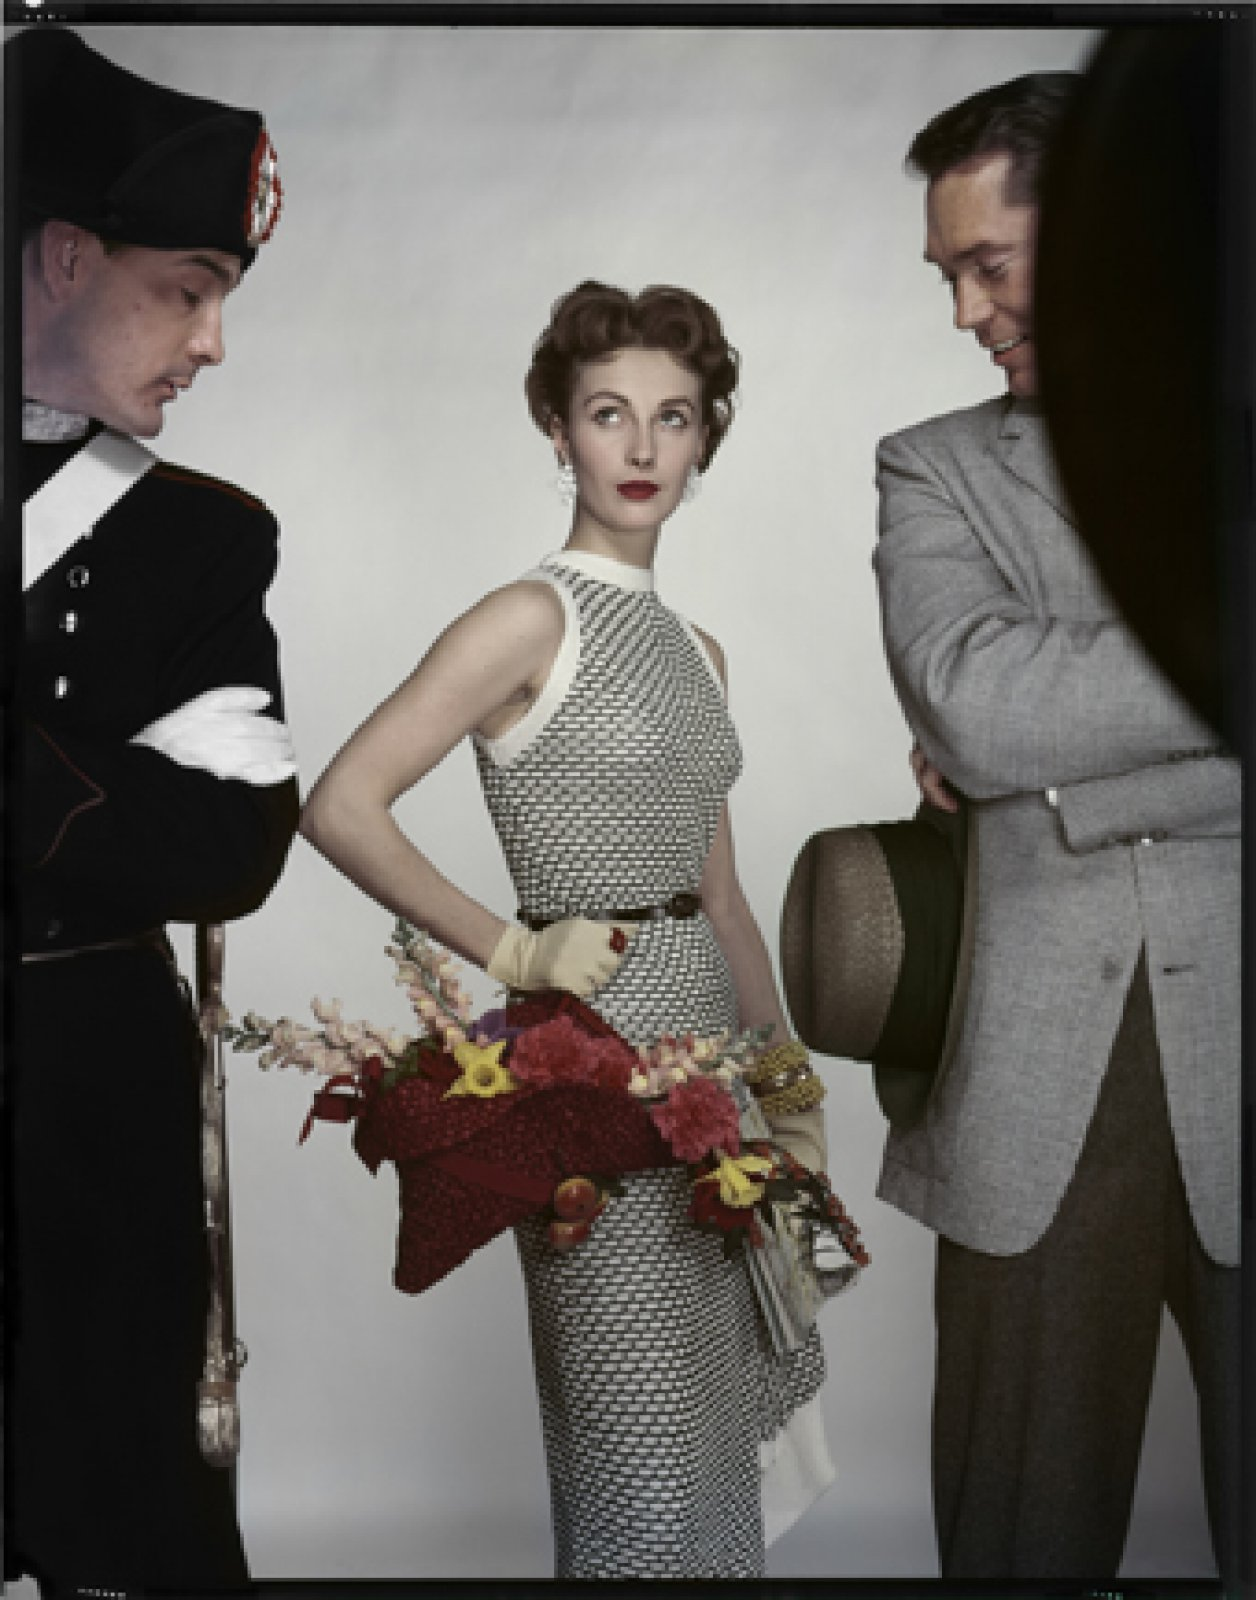 Untitled (model : Susan Jenks), circa 1946 © The Estate of Erwin Blumenfeld